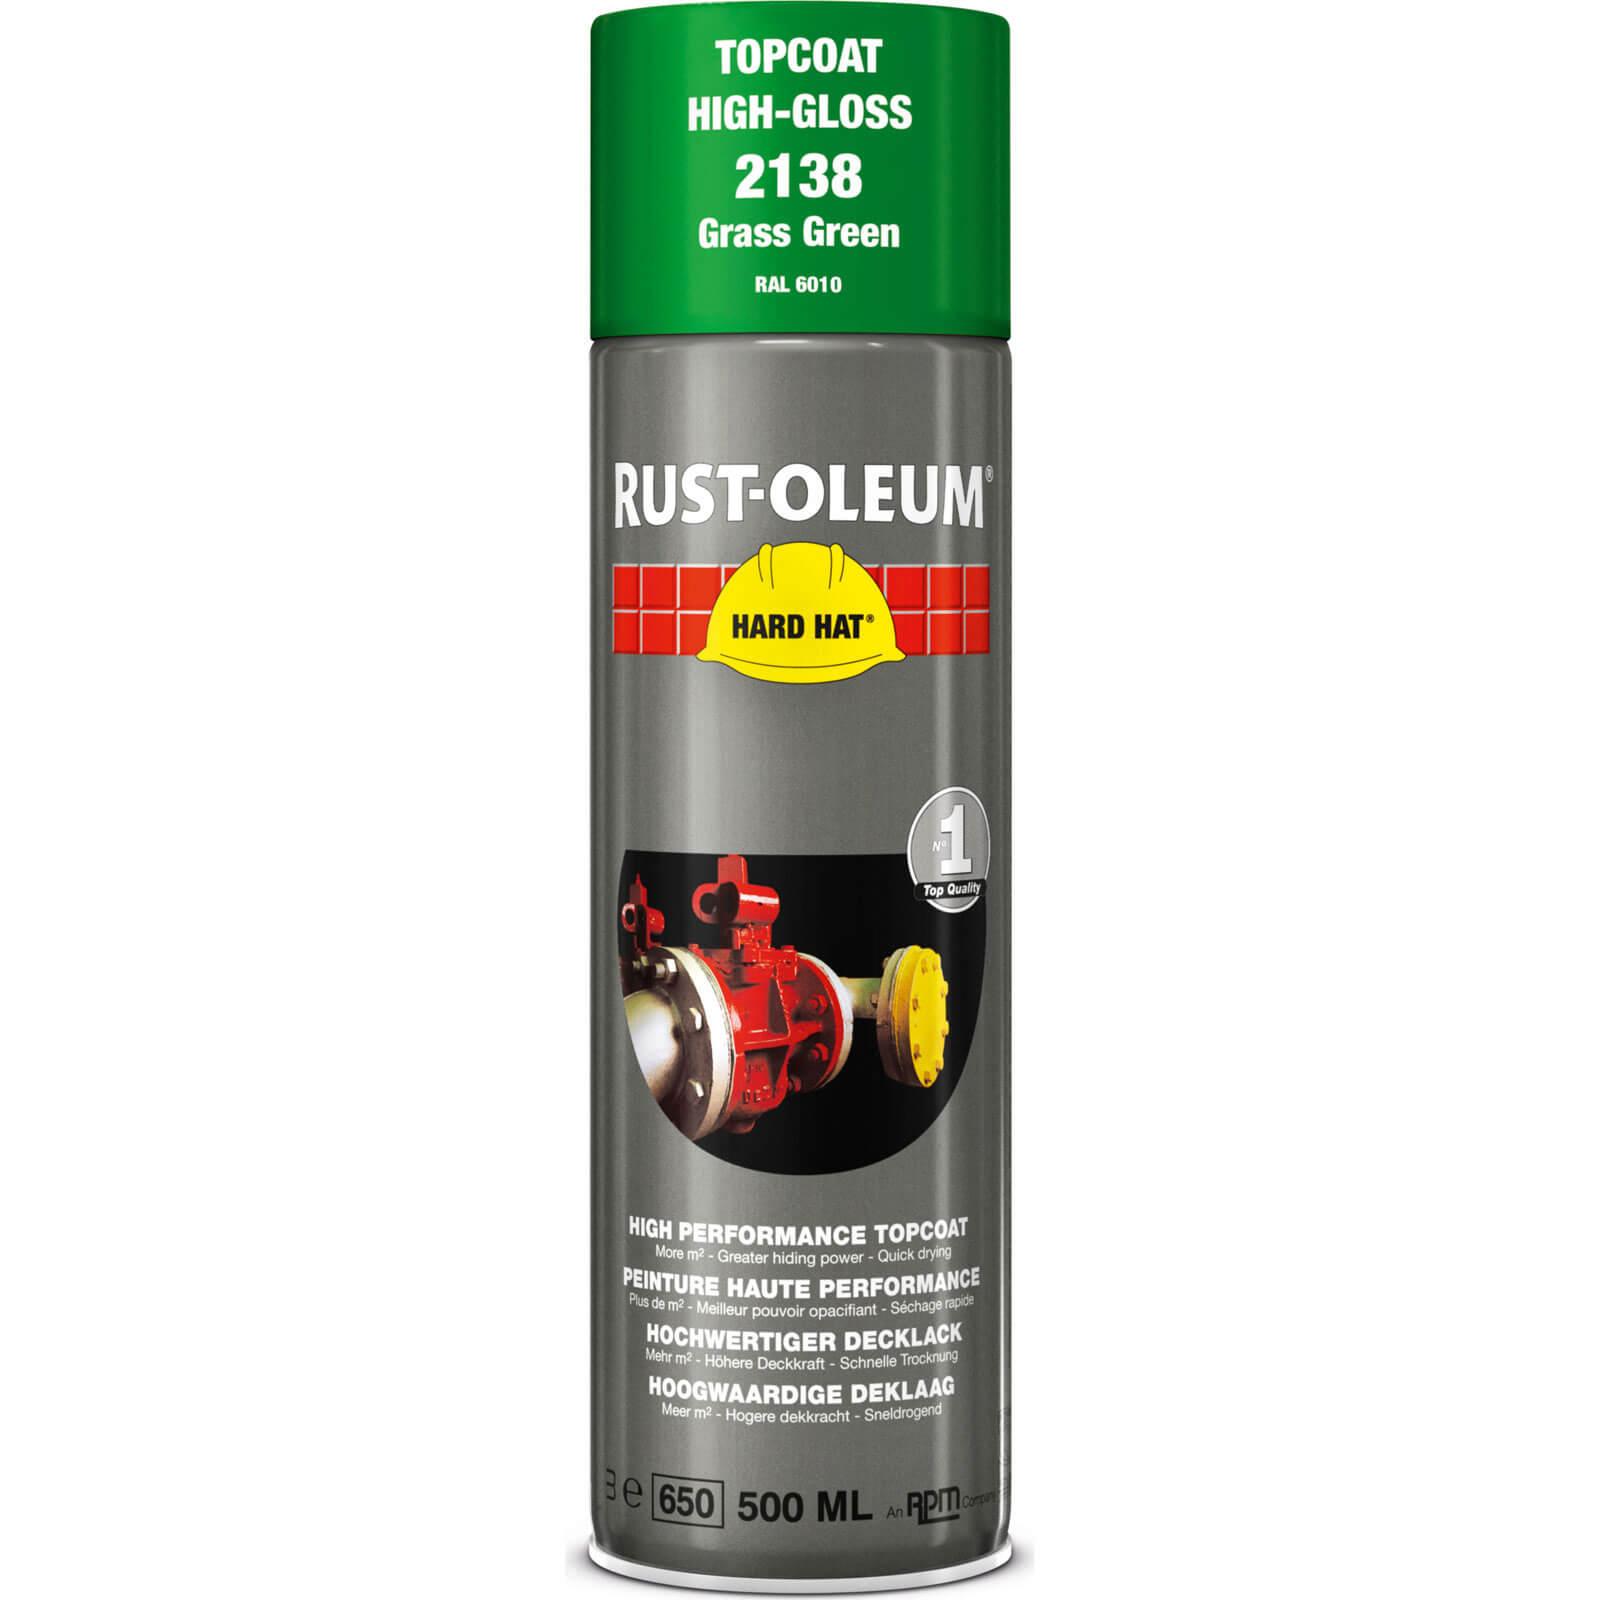 Rust Oleum Hard Hat Metal Spray Paint Grass Green 500ml